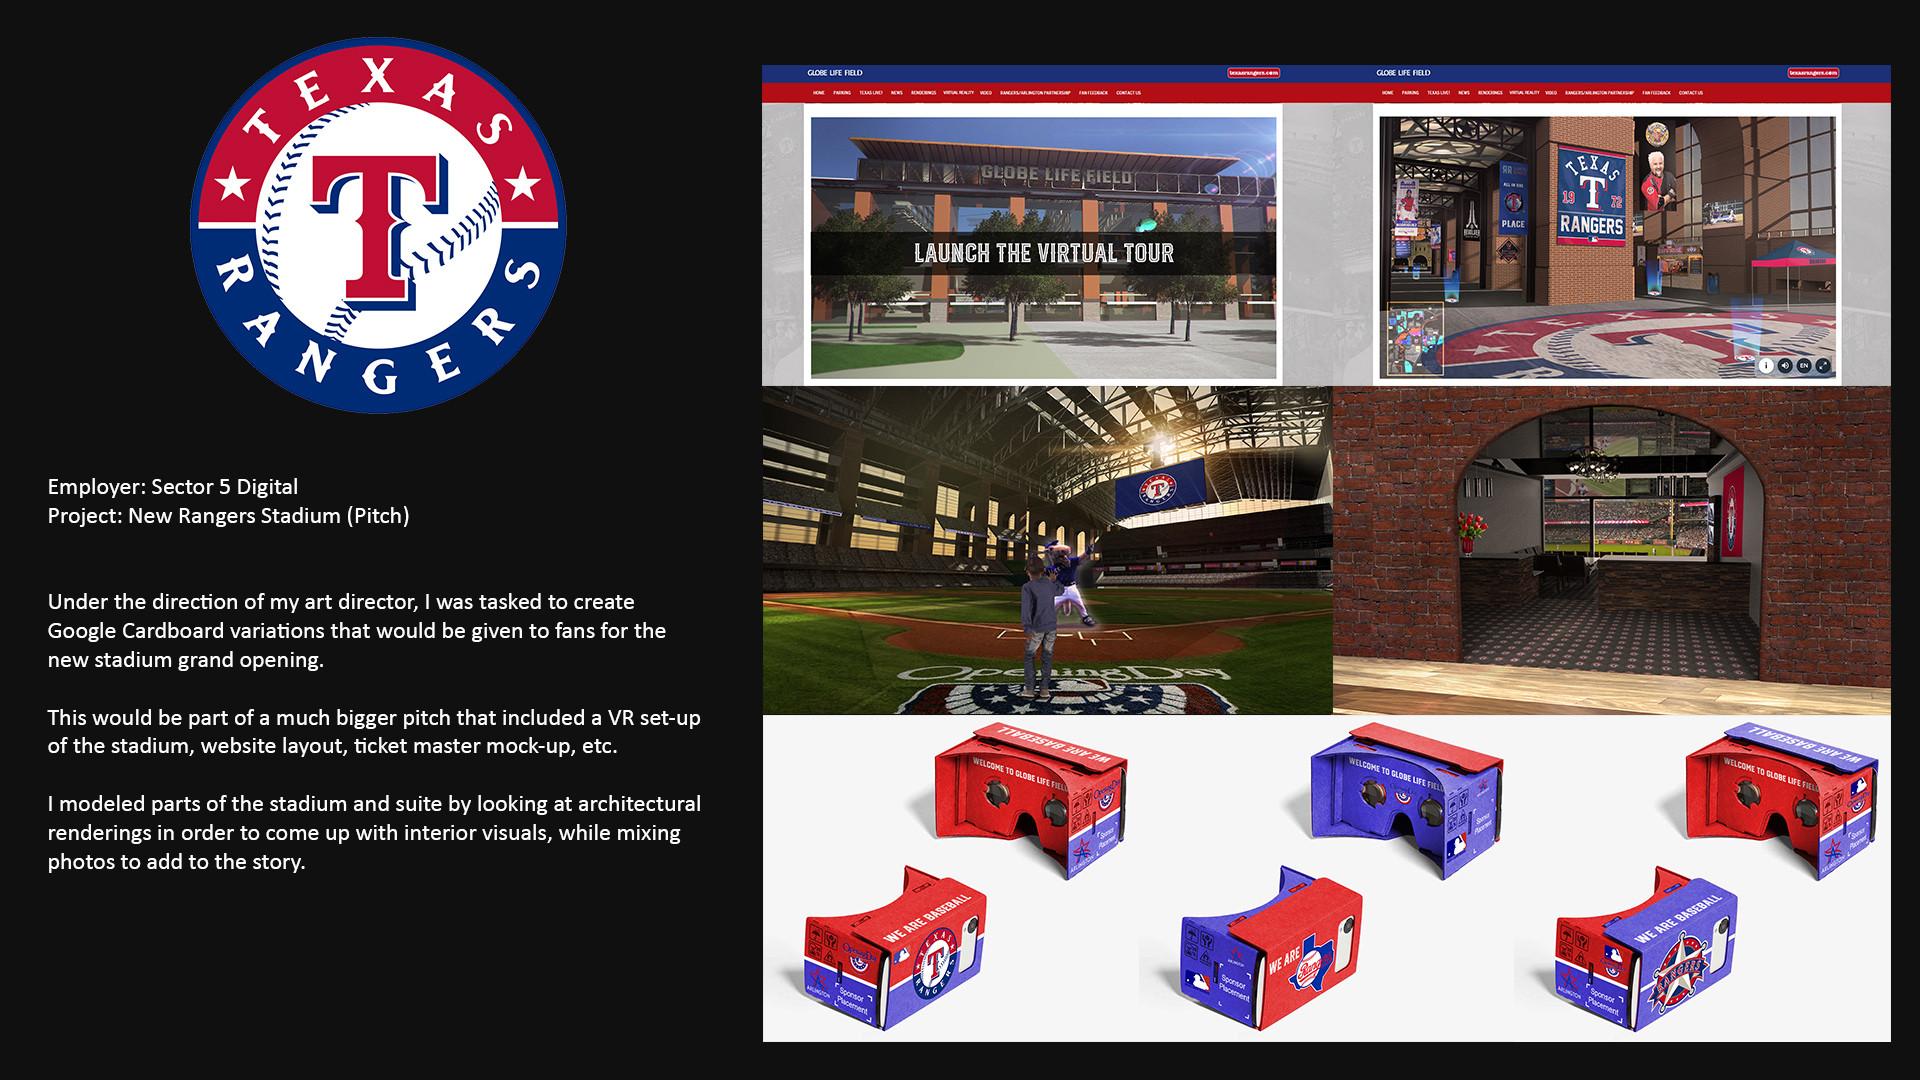 New Ranger Stadium Pitch